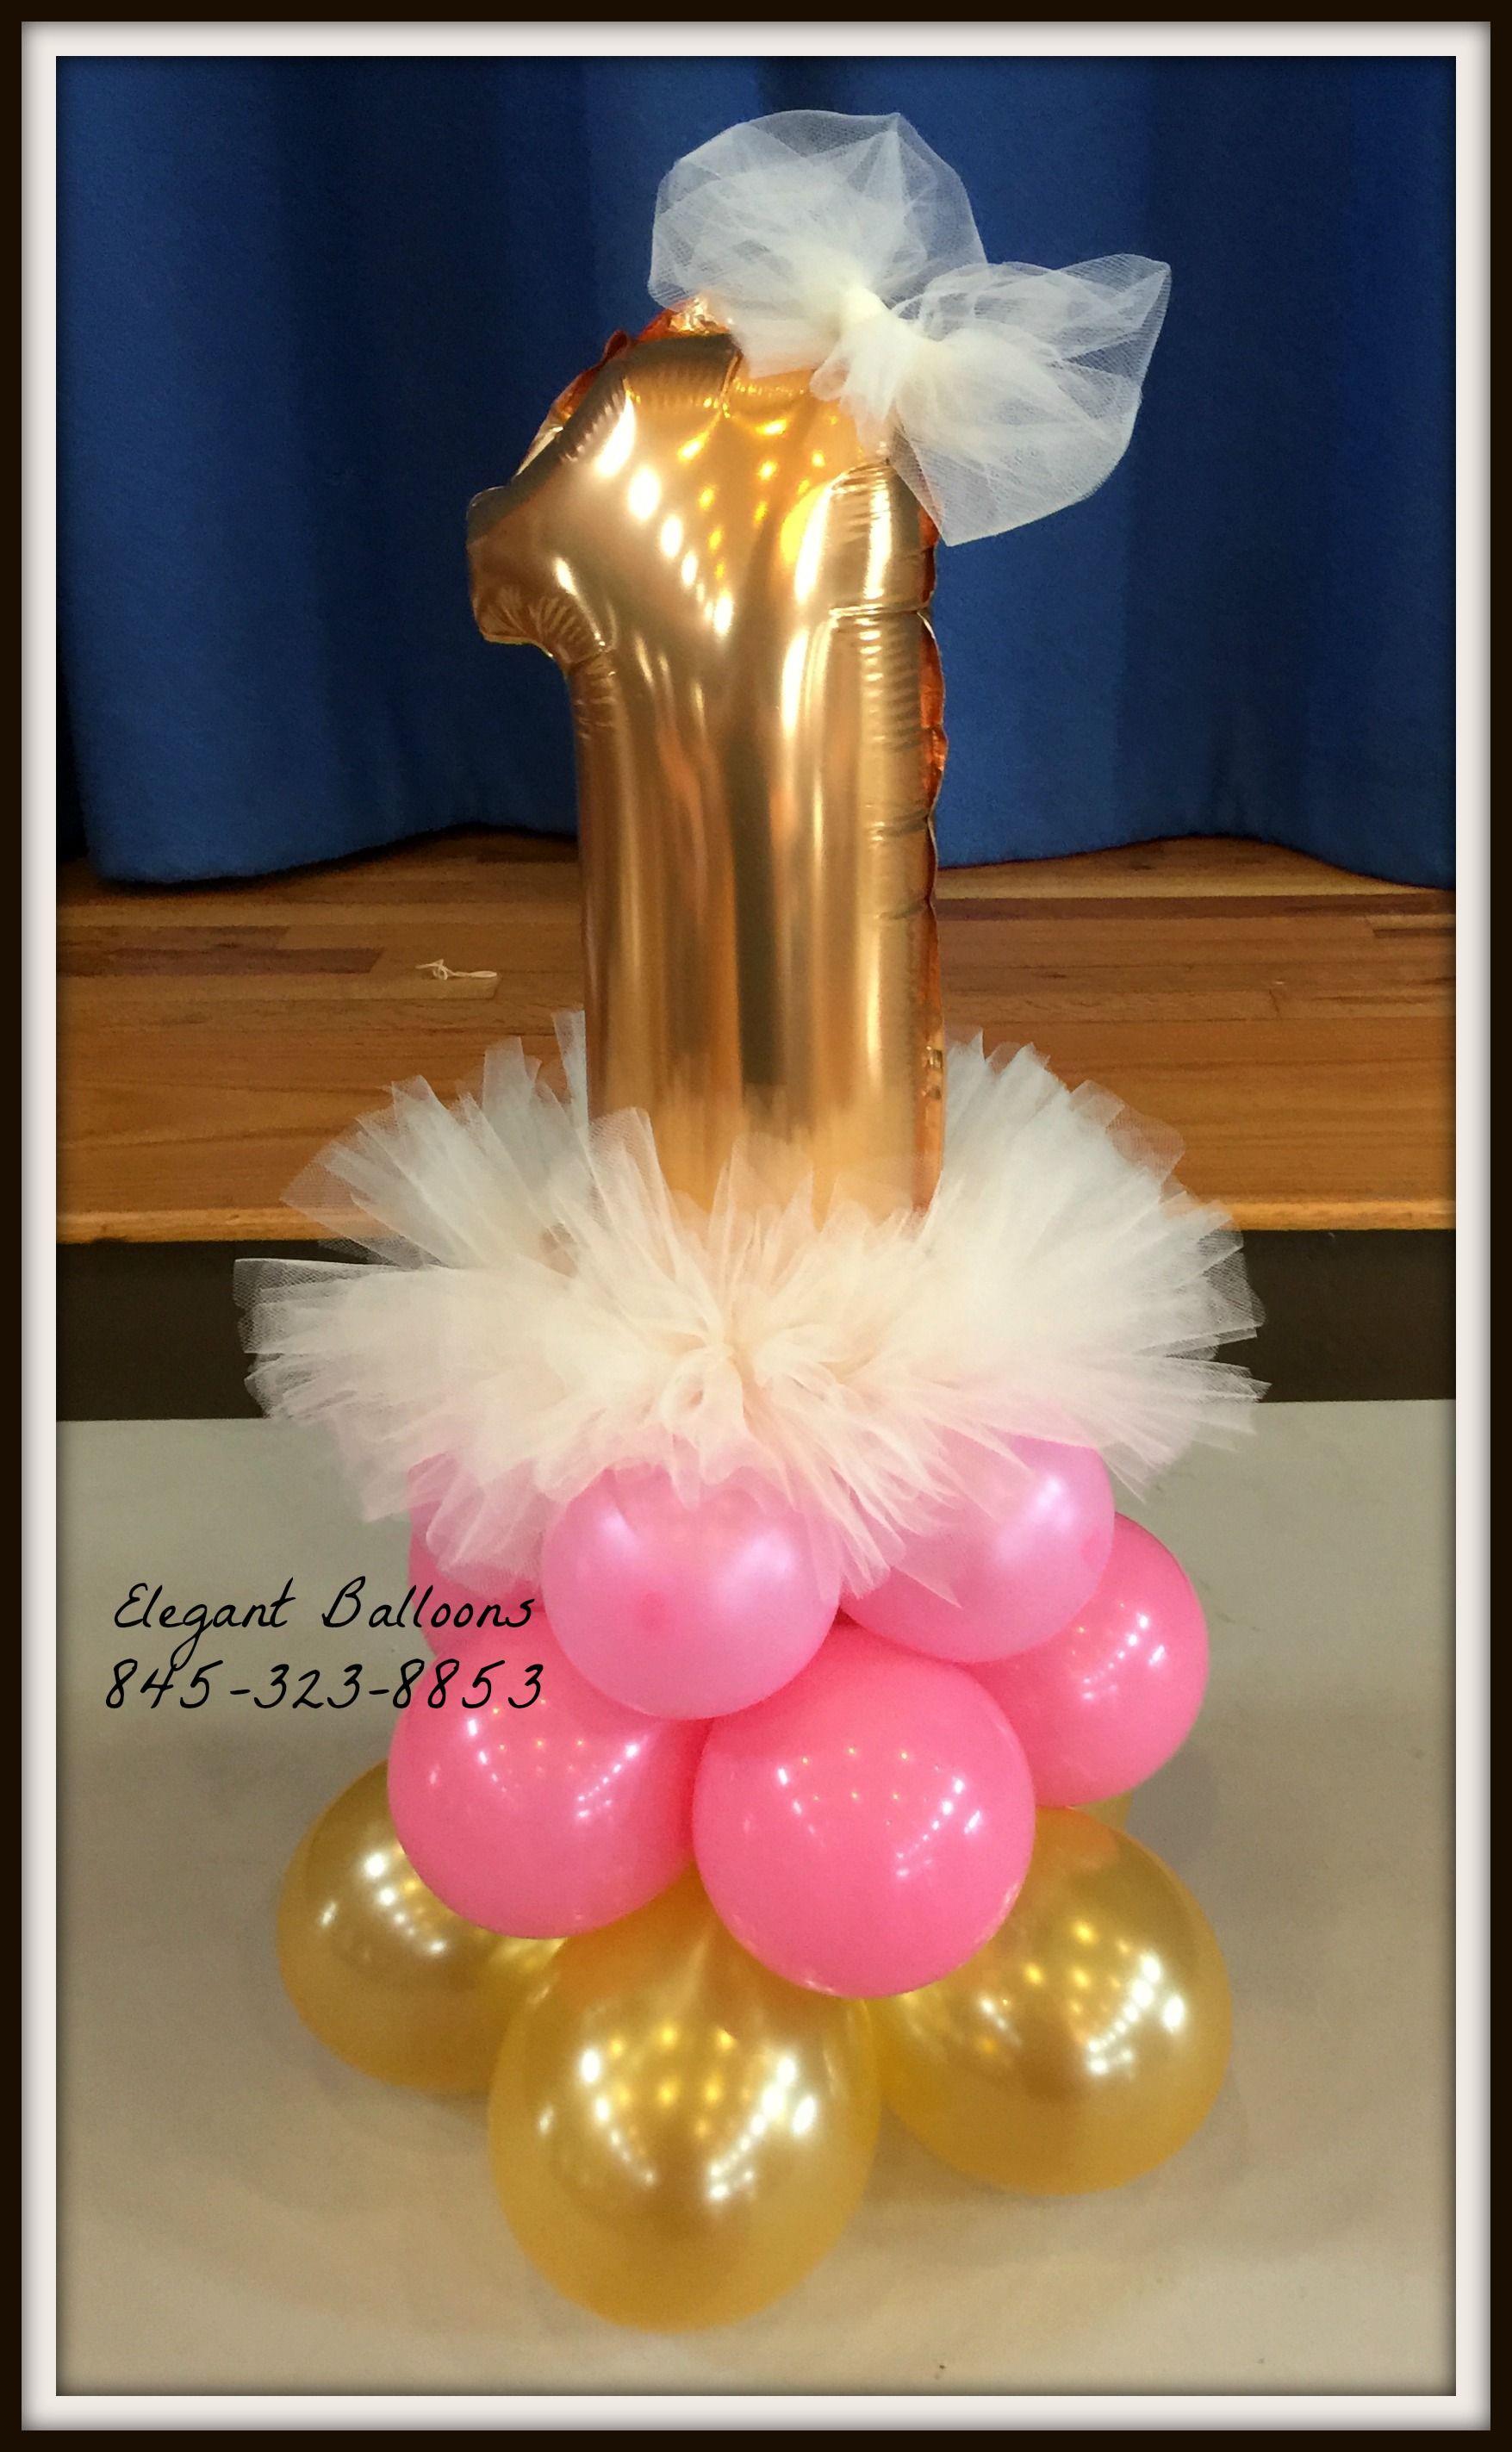 Princess Balloon Decoration 1st Birthday Princess Balloon Centerpieces Partywithballoons